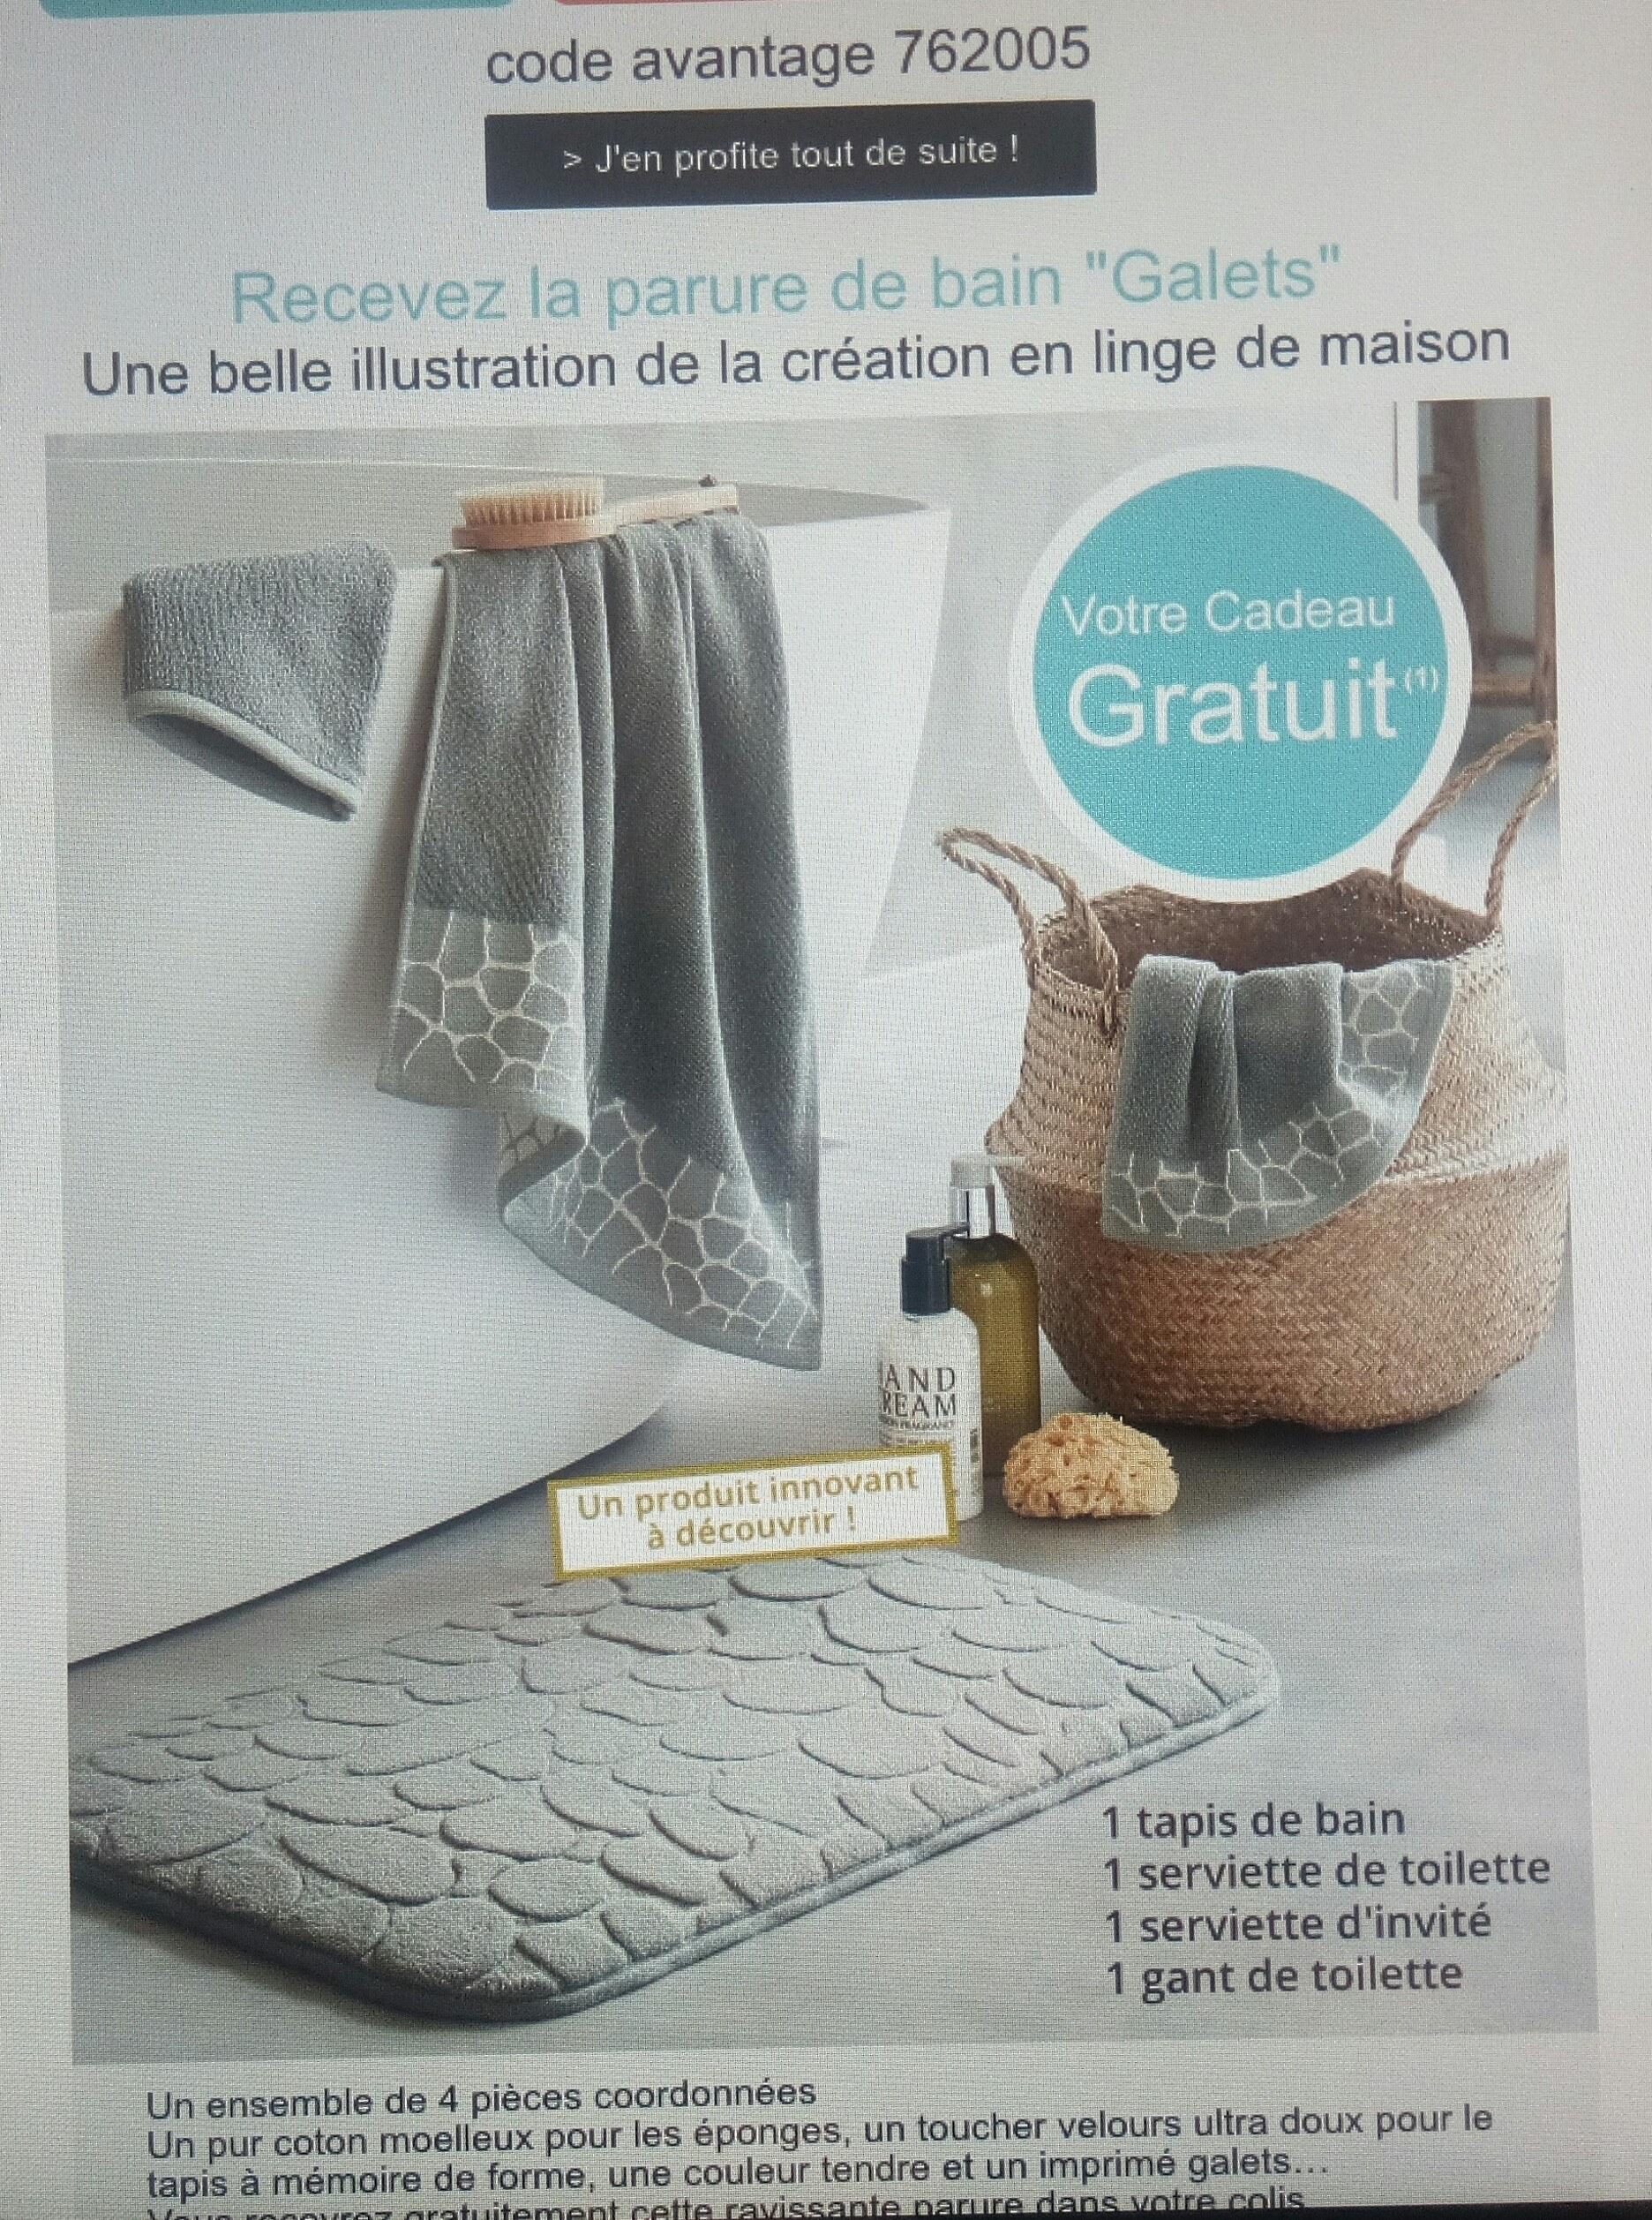 code promo becquet parure de bain en cadeau. Black Bedroom Furniture Sets. Home Design Ideas